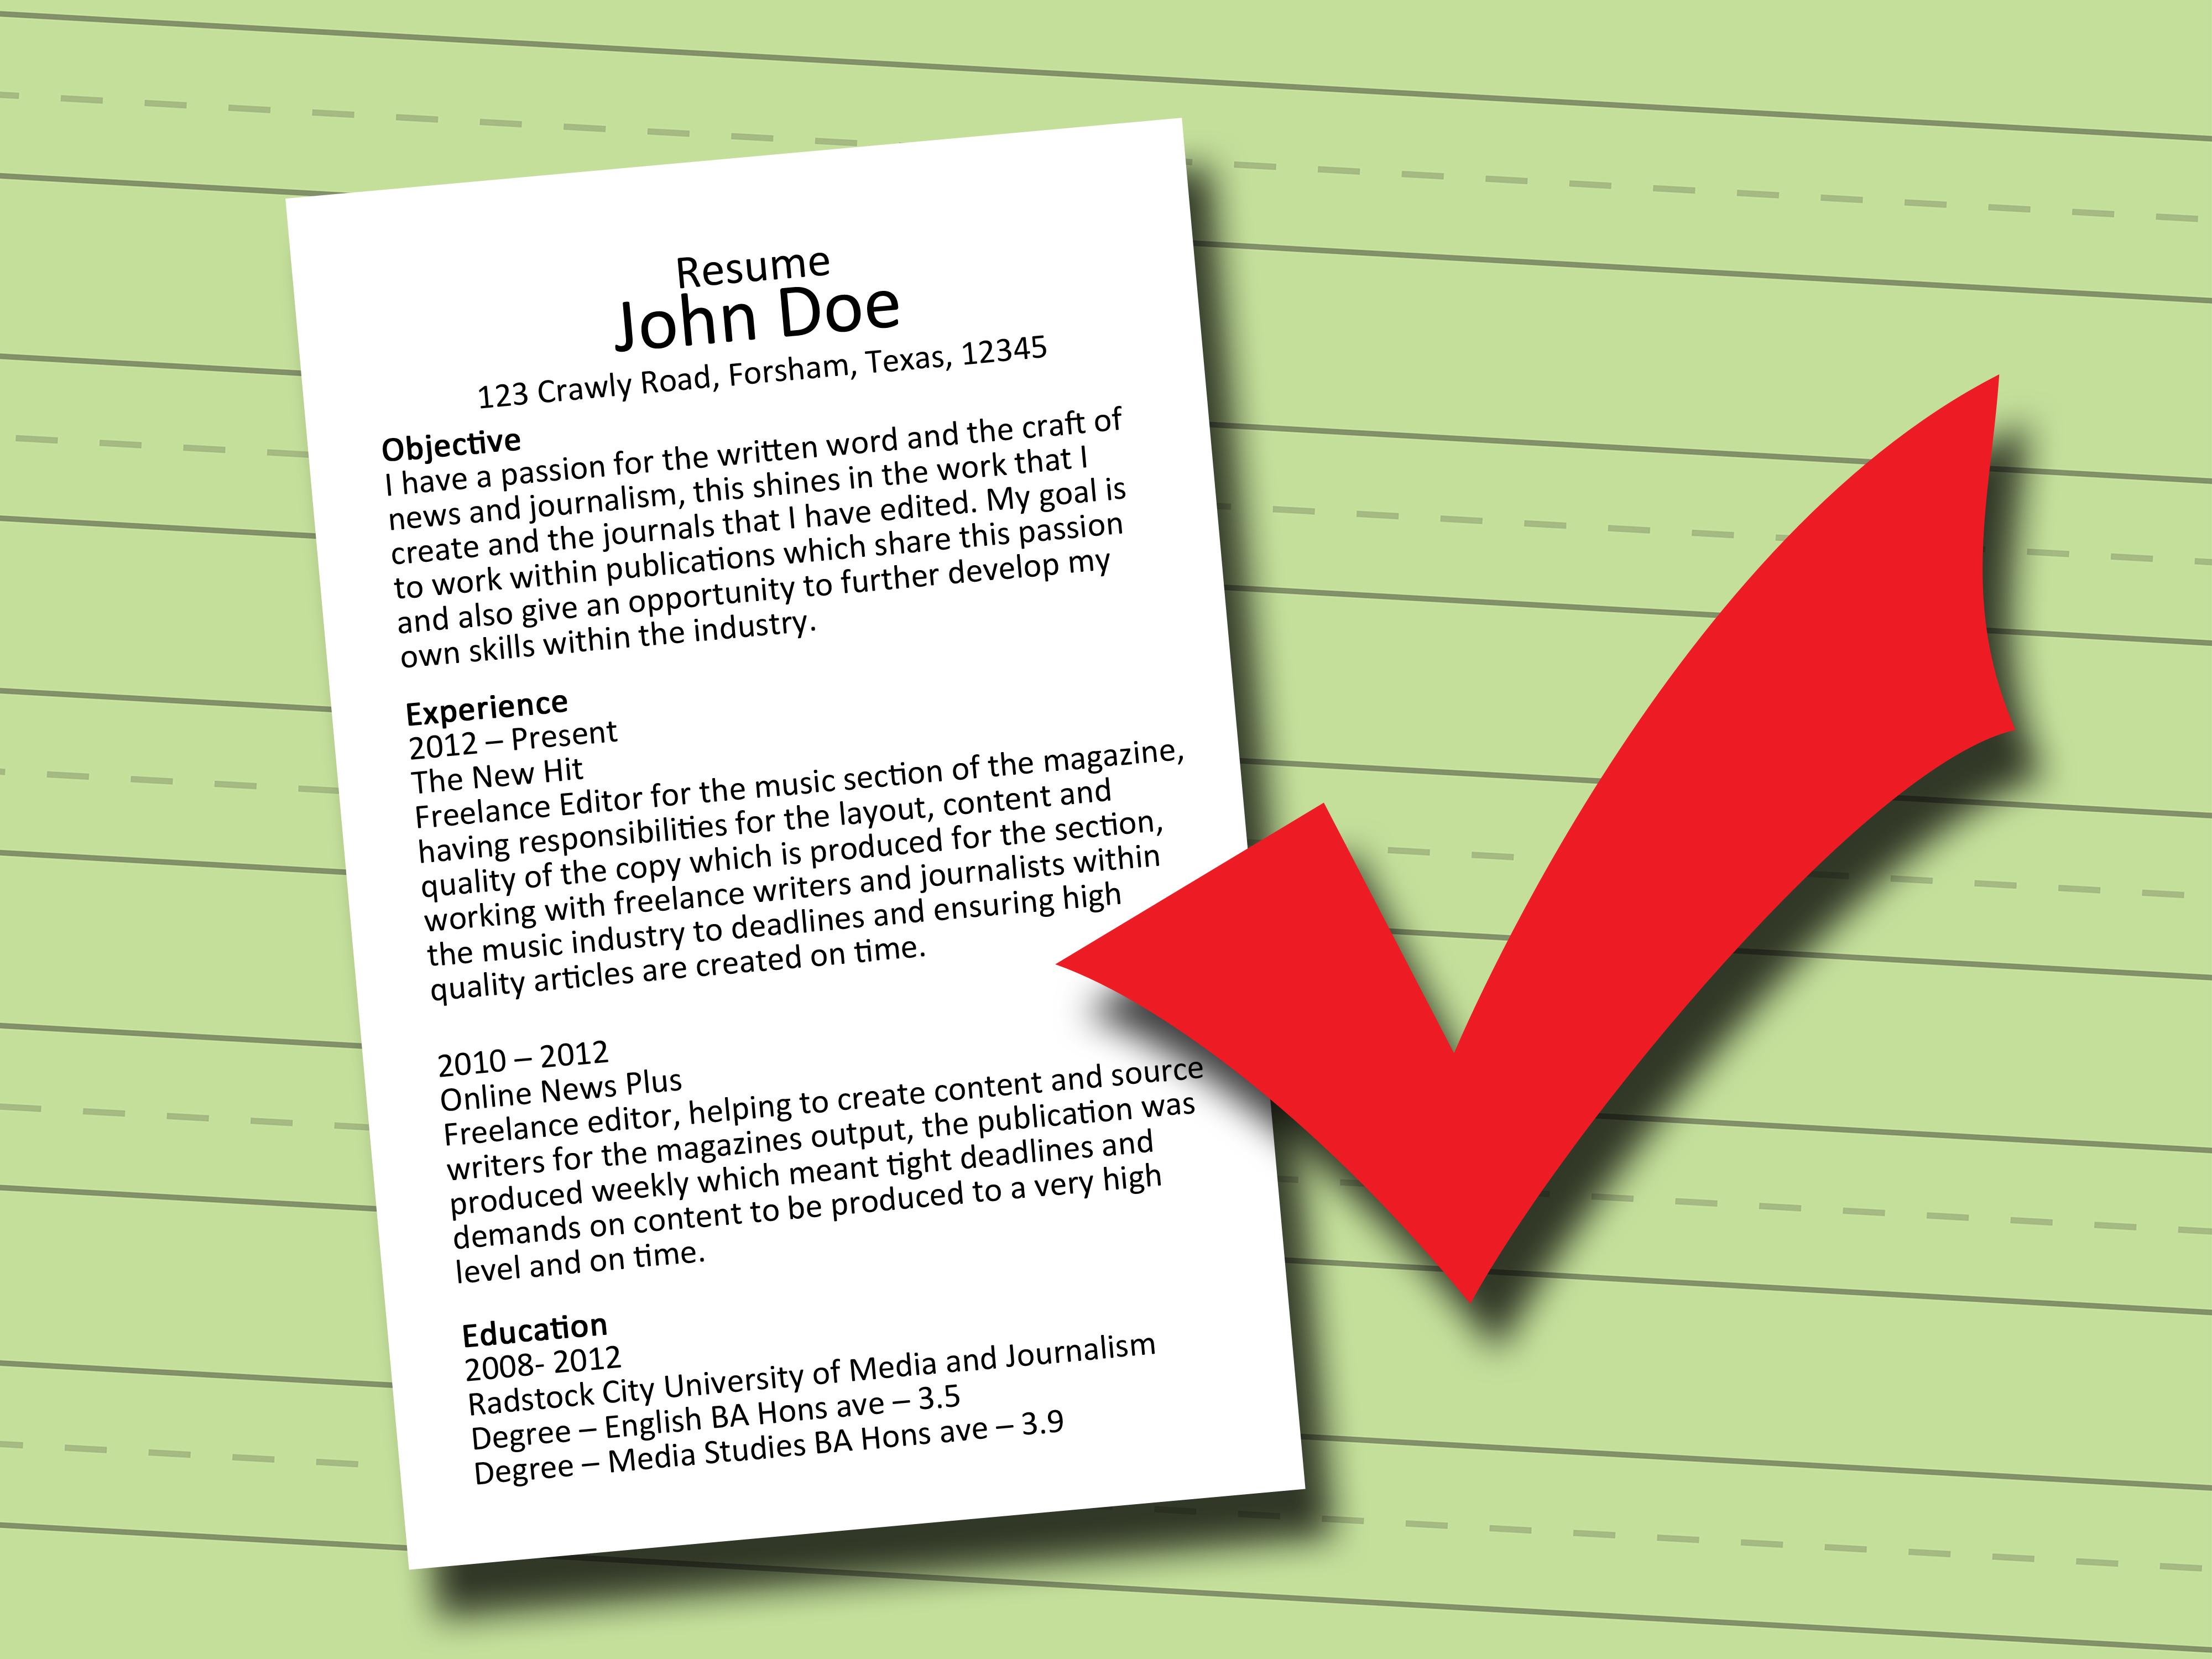 jobs resume writing freelance resume writer jobs employment indeed how